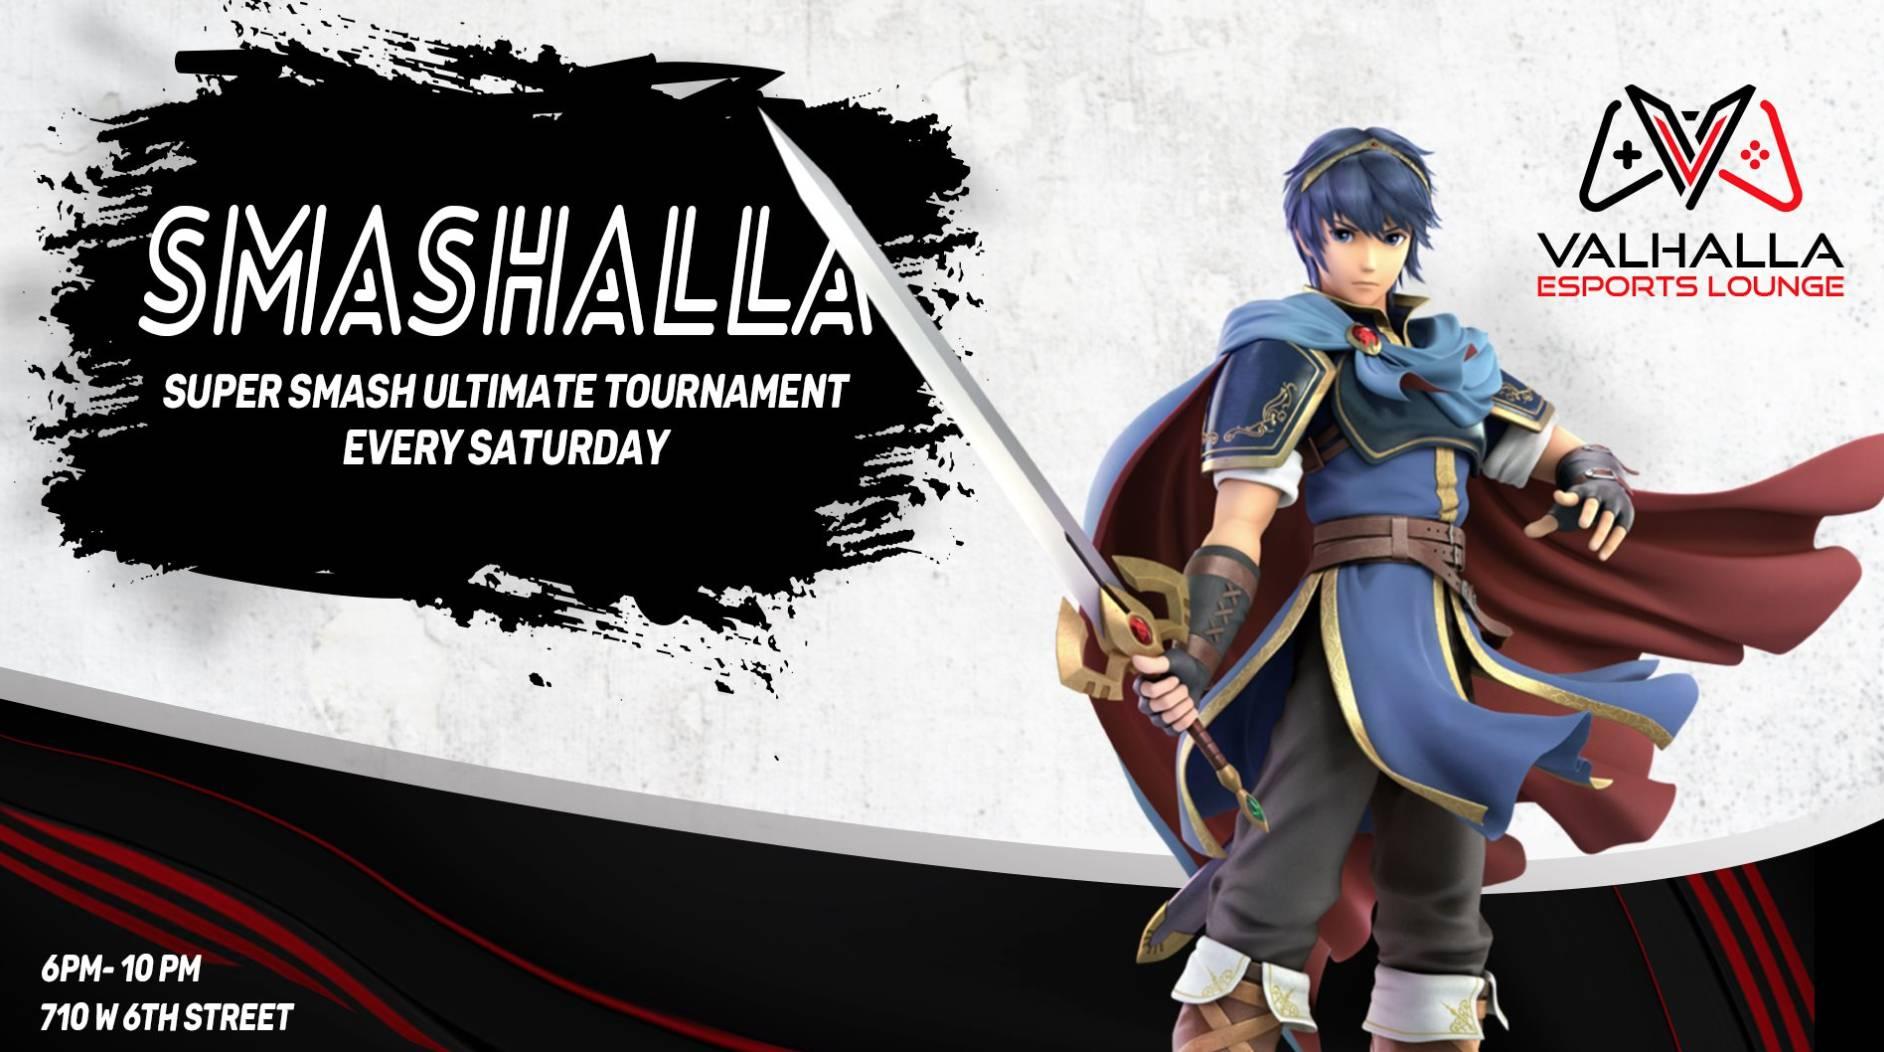 Smashalla